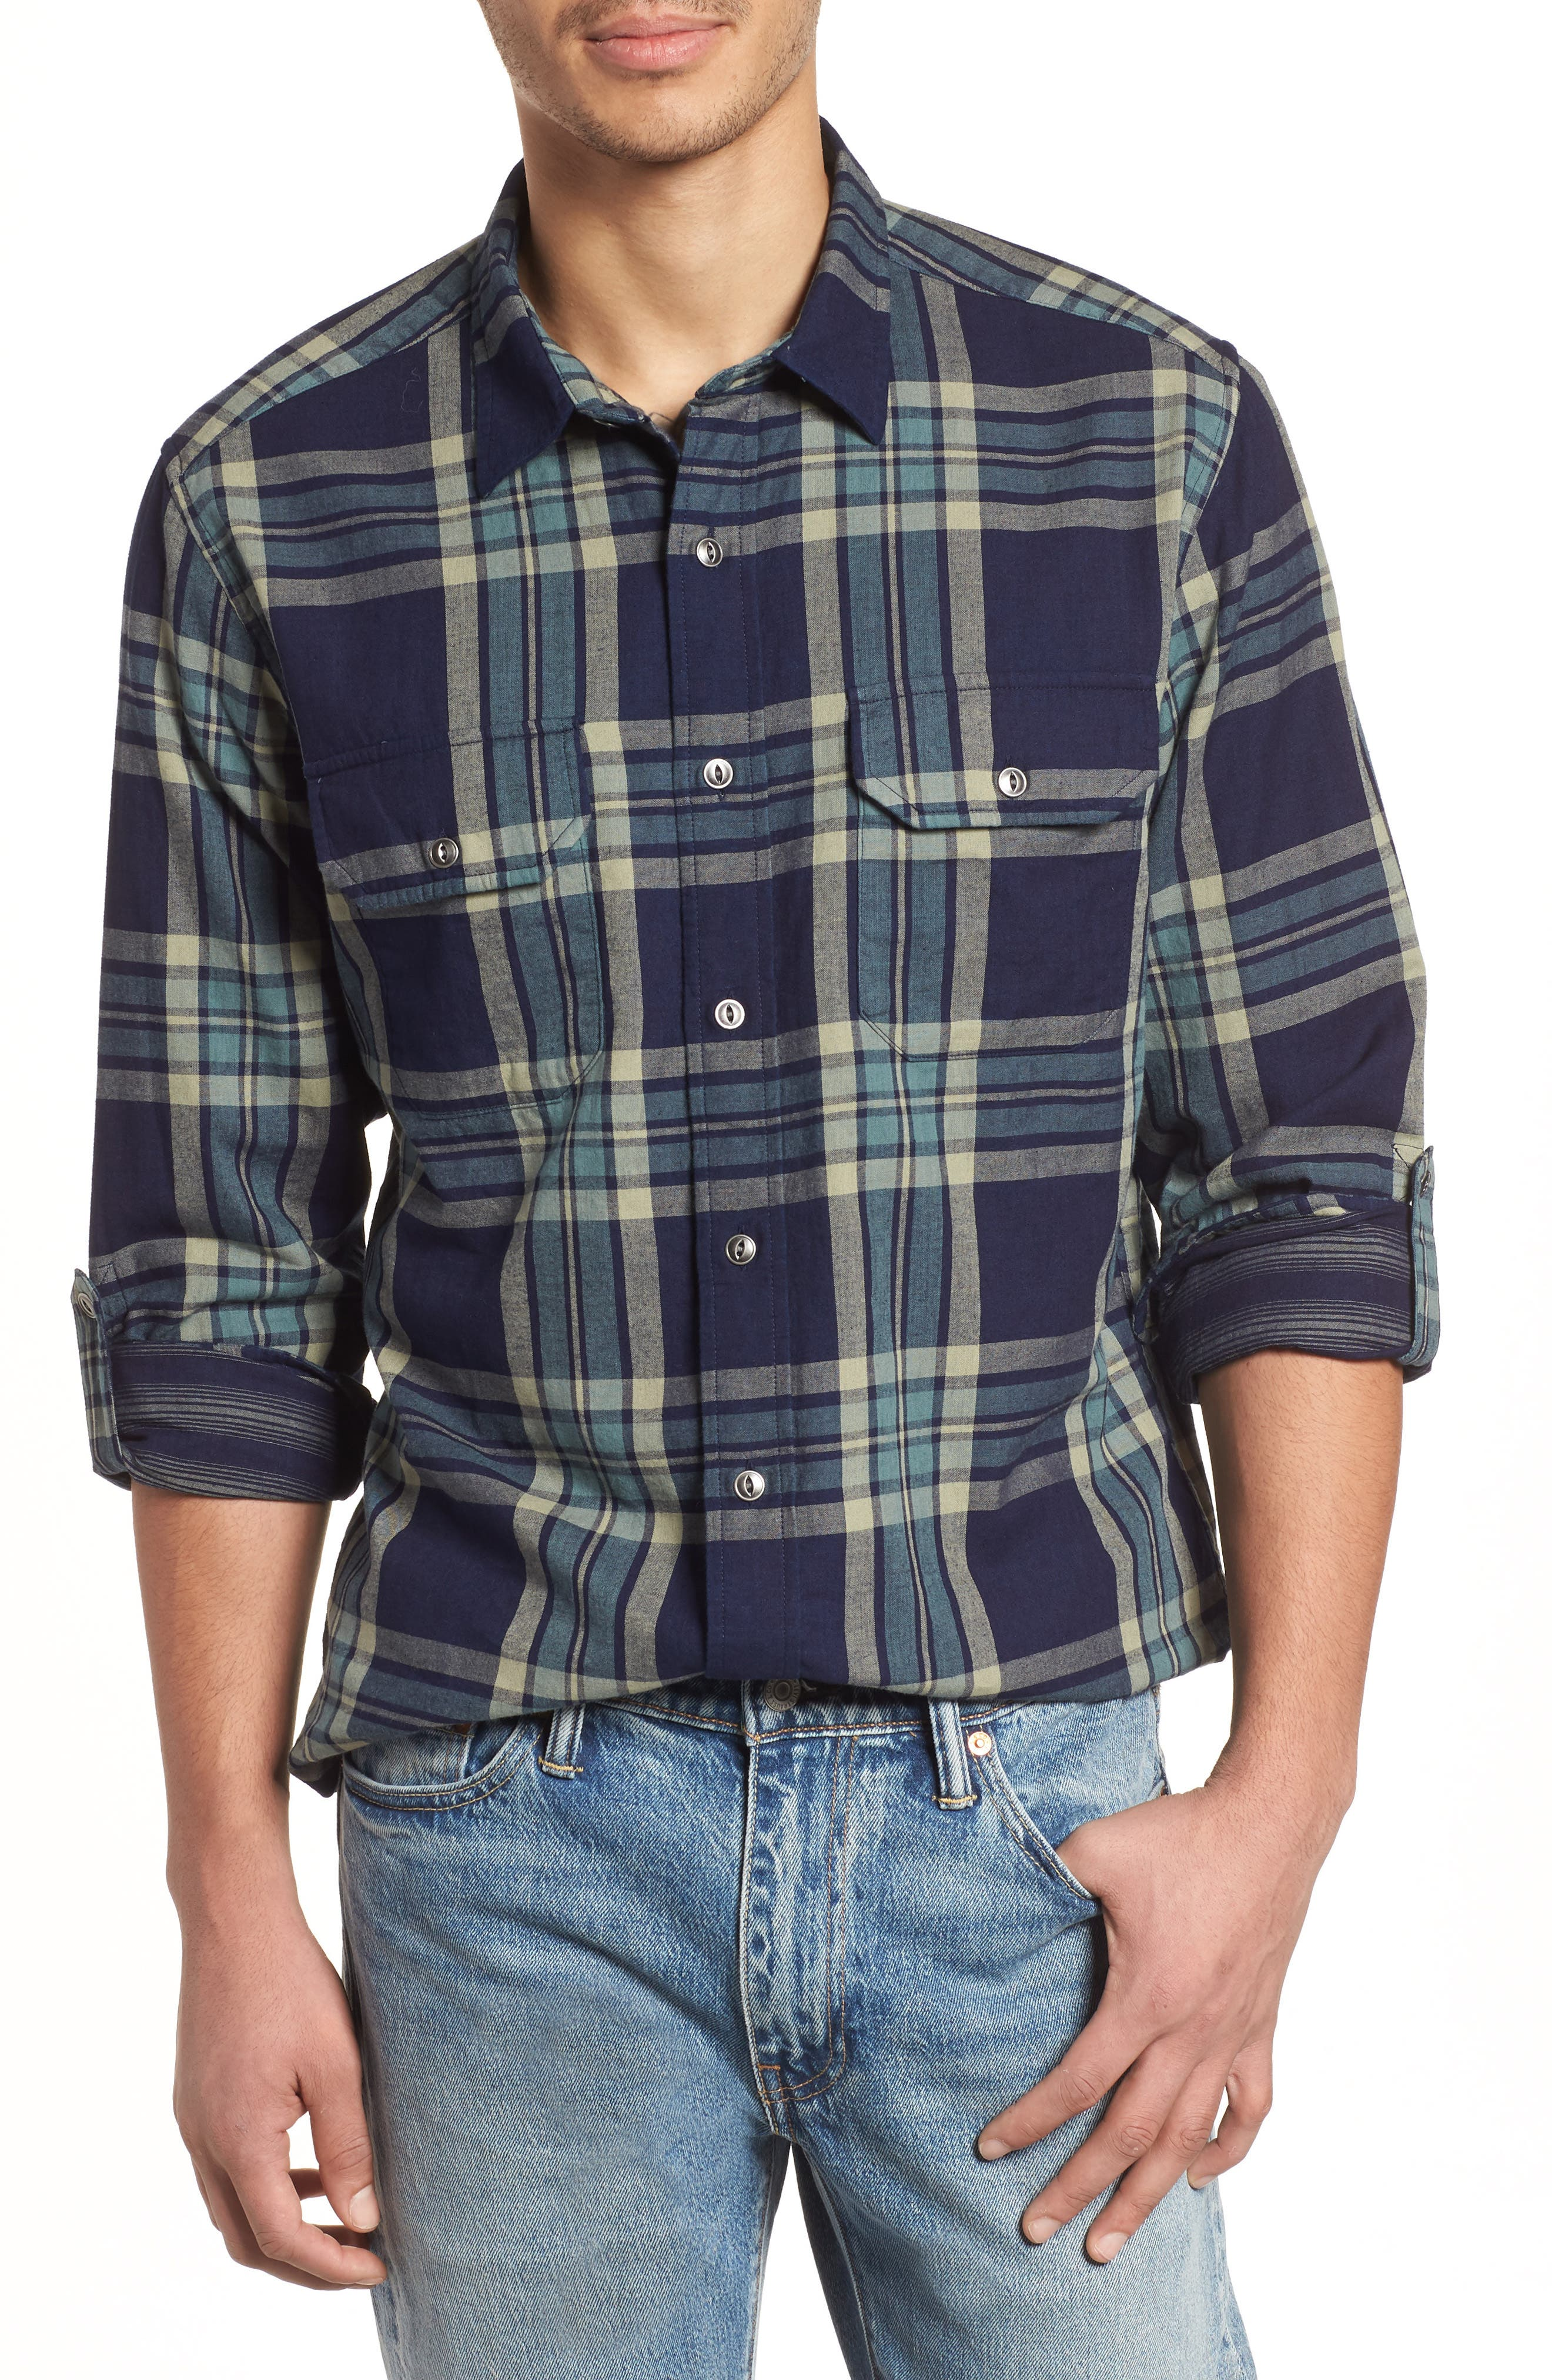 Thomas Kay Double Face Shirt,                         Main,                         color, Indigo Plaid